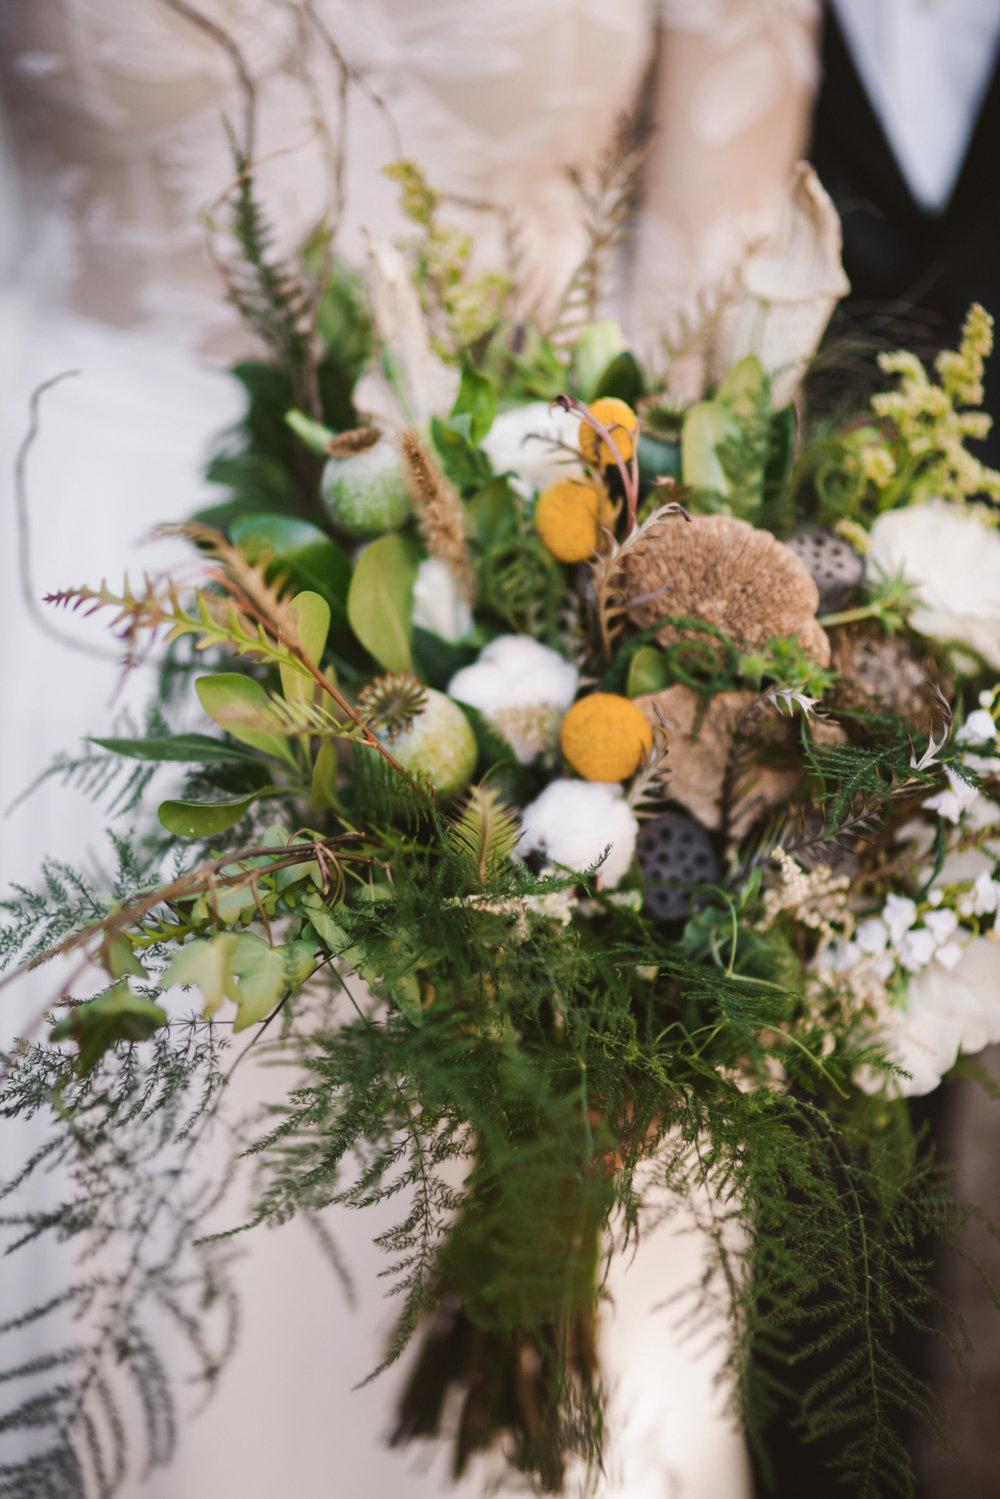 Kimberly-Coccagnia-Wedding-Photographer-139.JPG